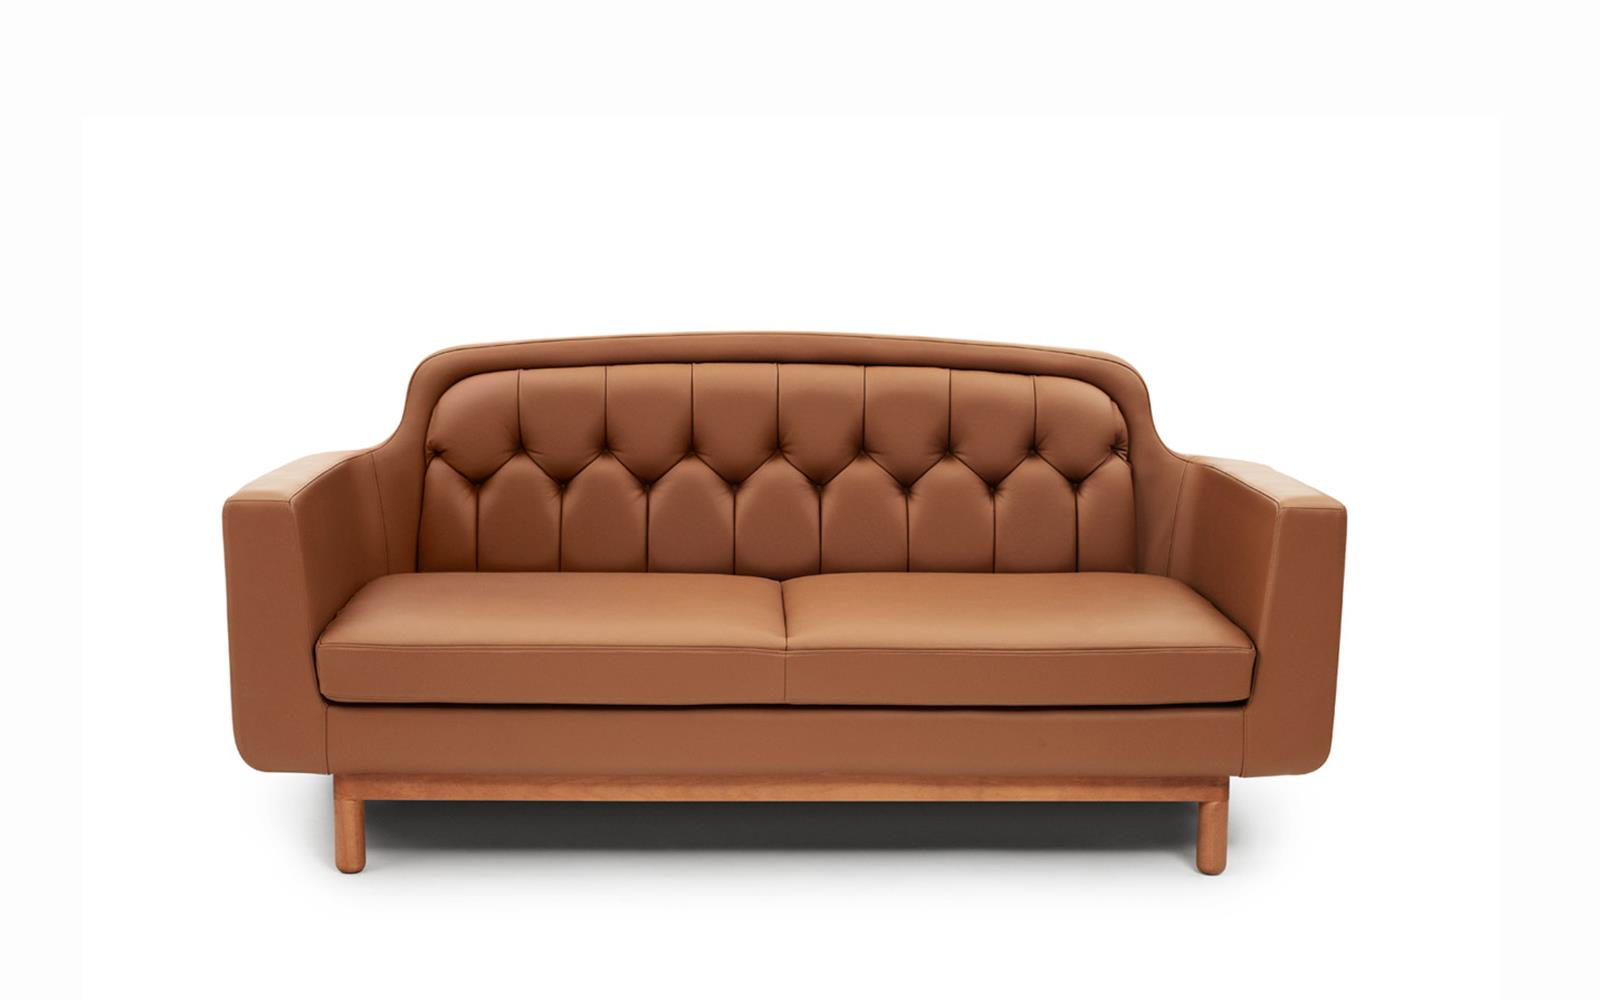 Onkel Sofa 2 Seater Leather1